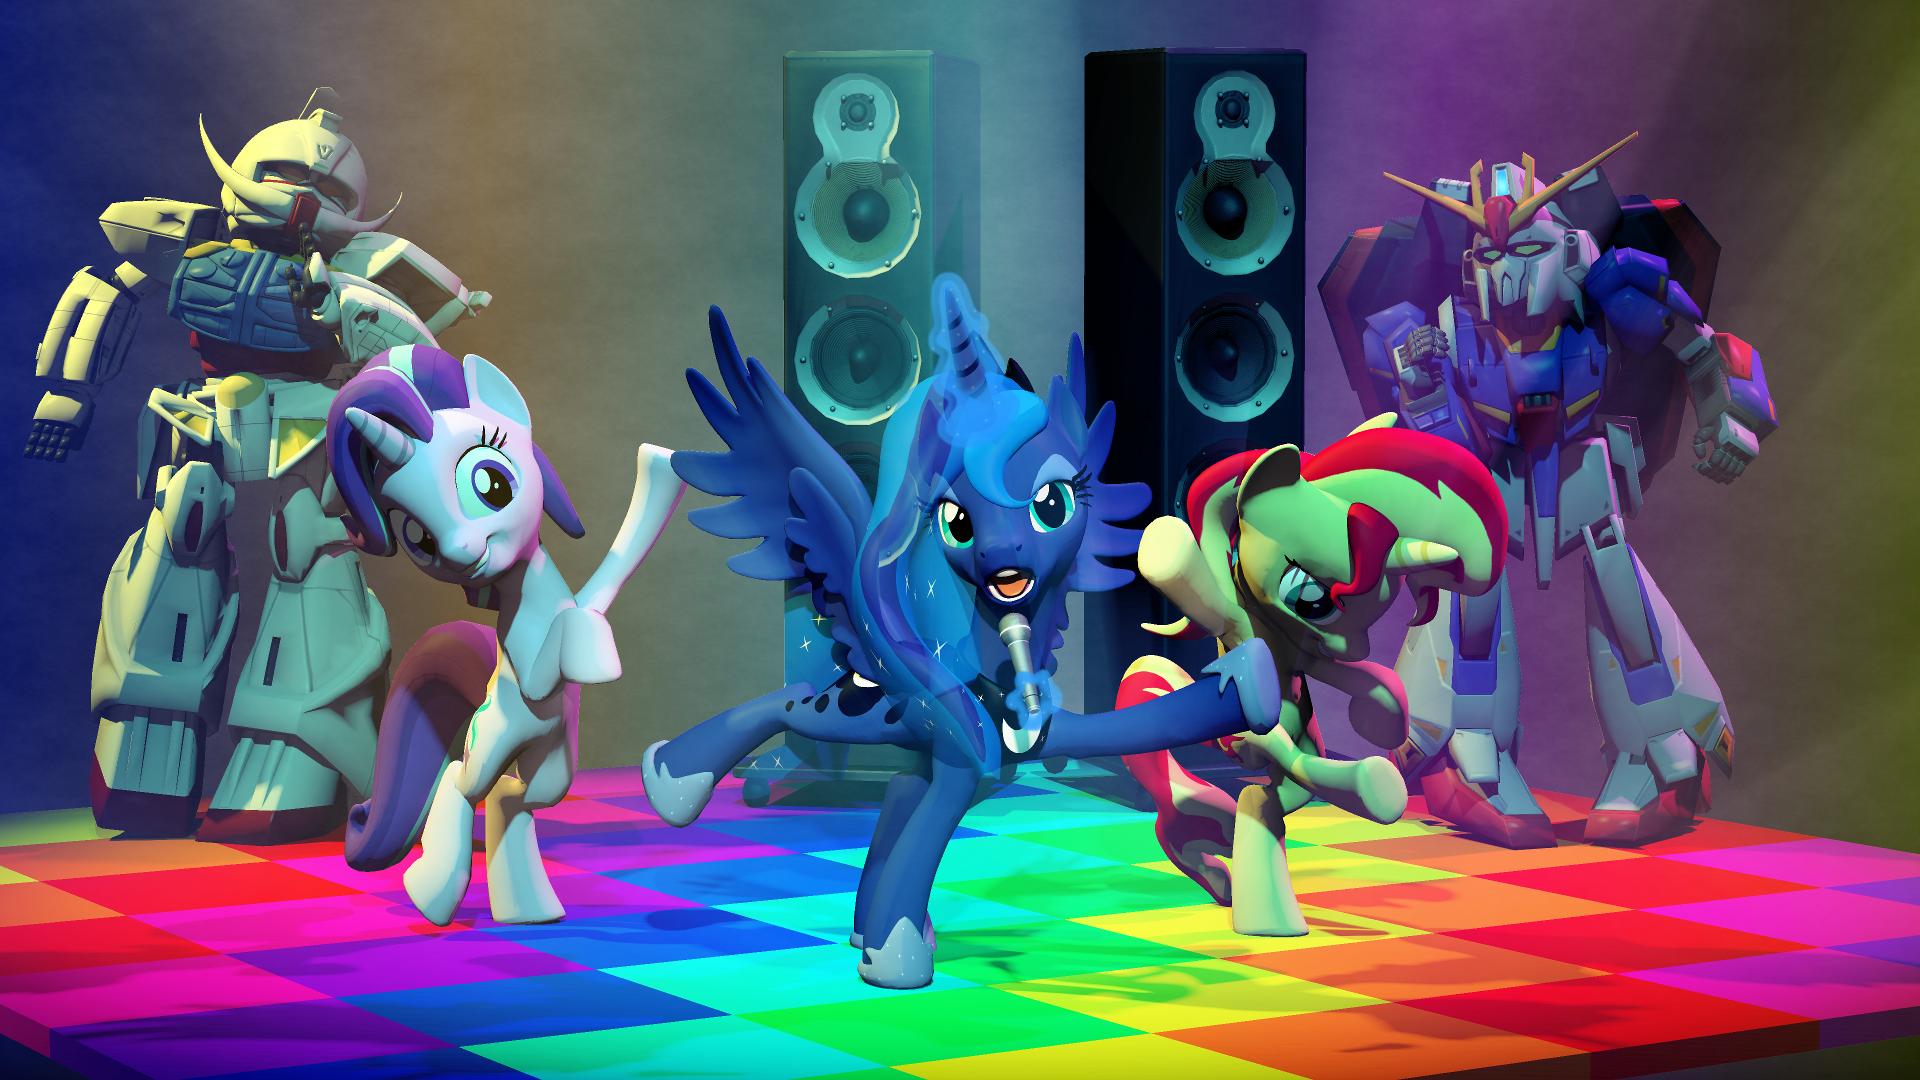 [GMOD] Seven Colors Dance Stuff by Tehwatever